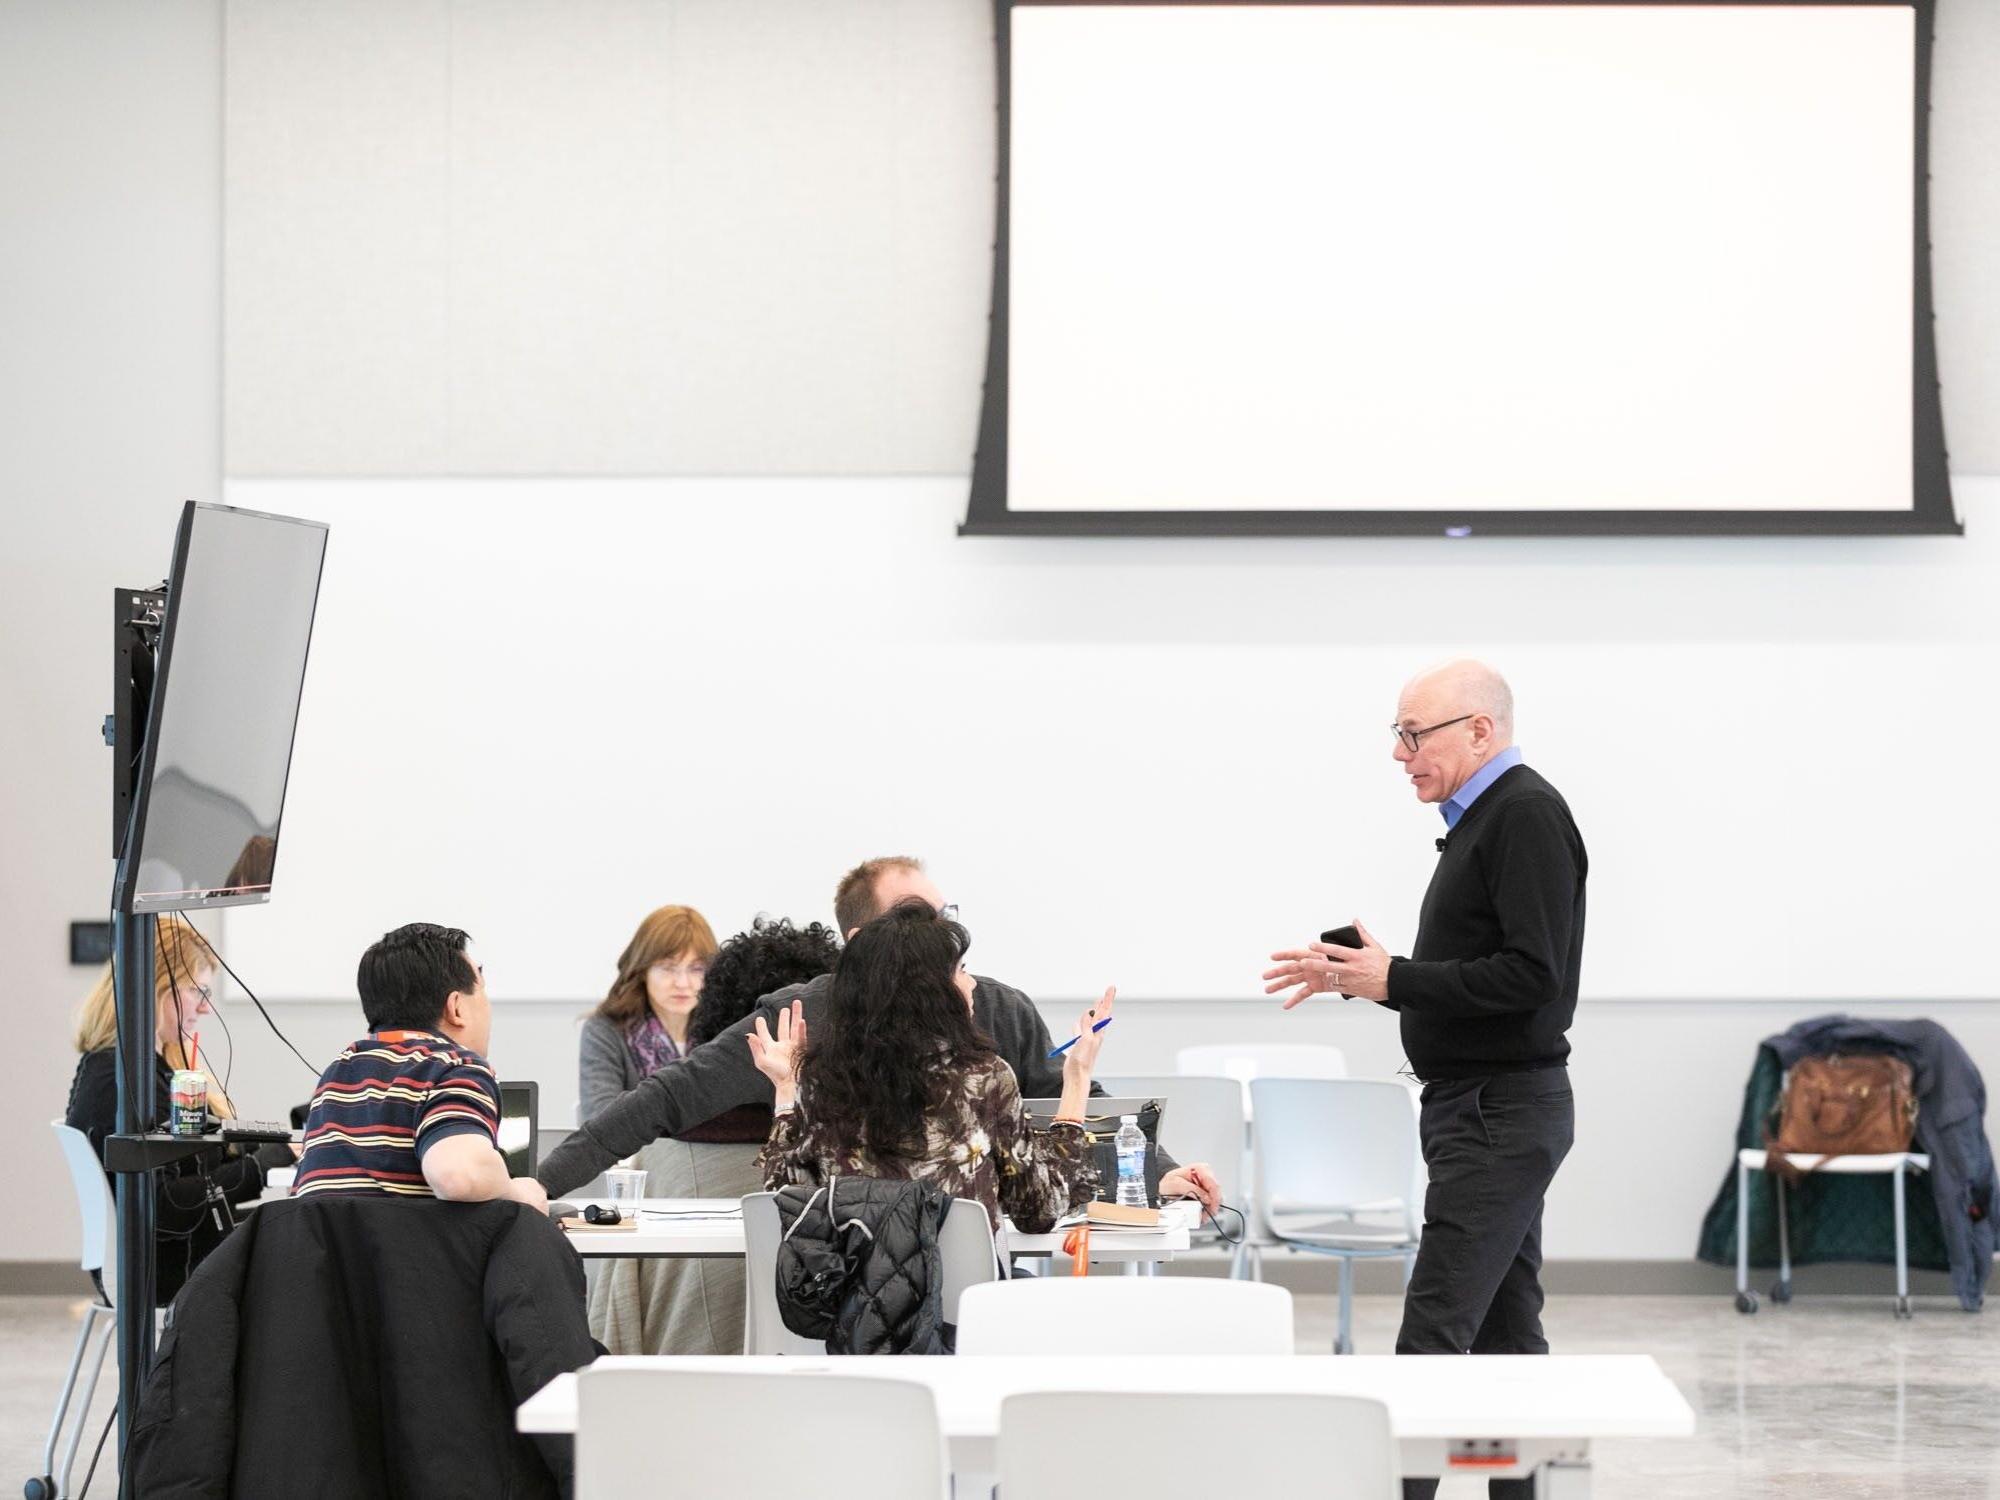 Guiding Teaching Practice